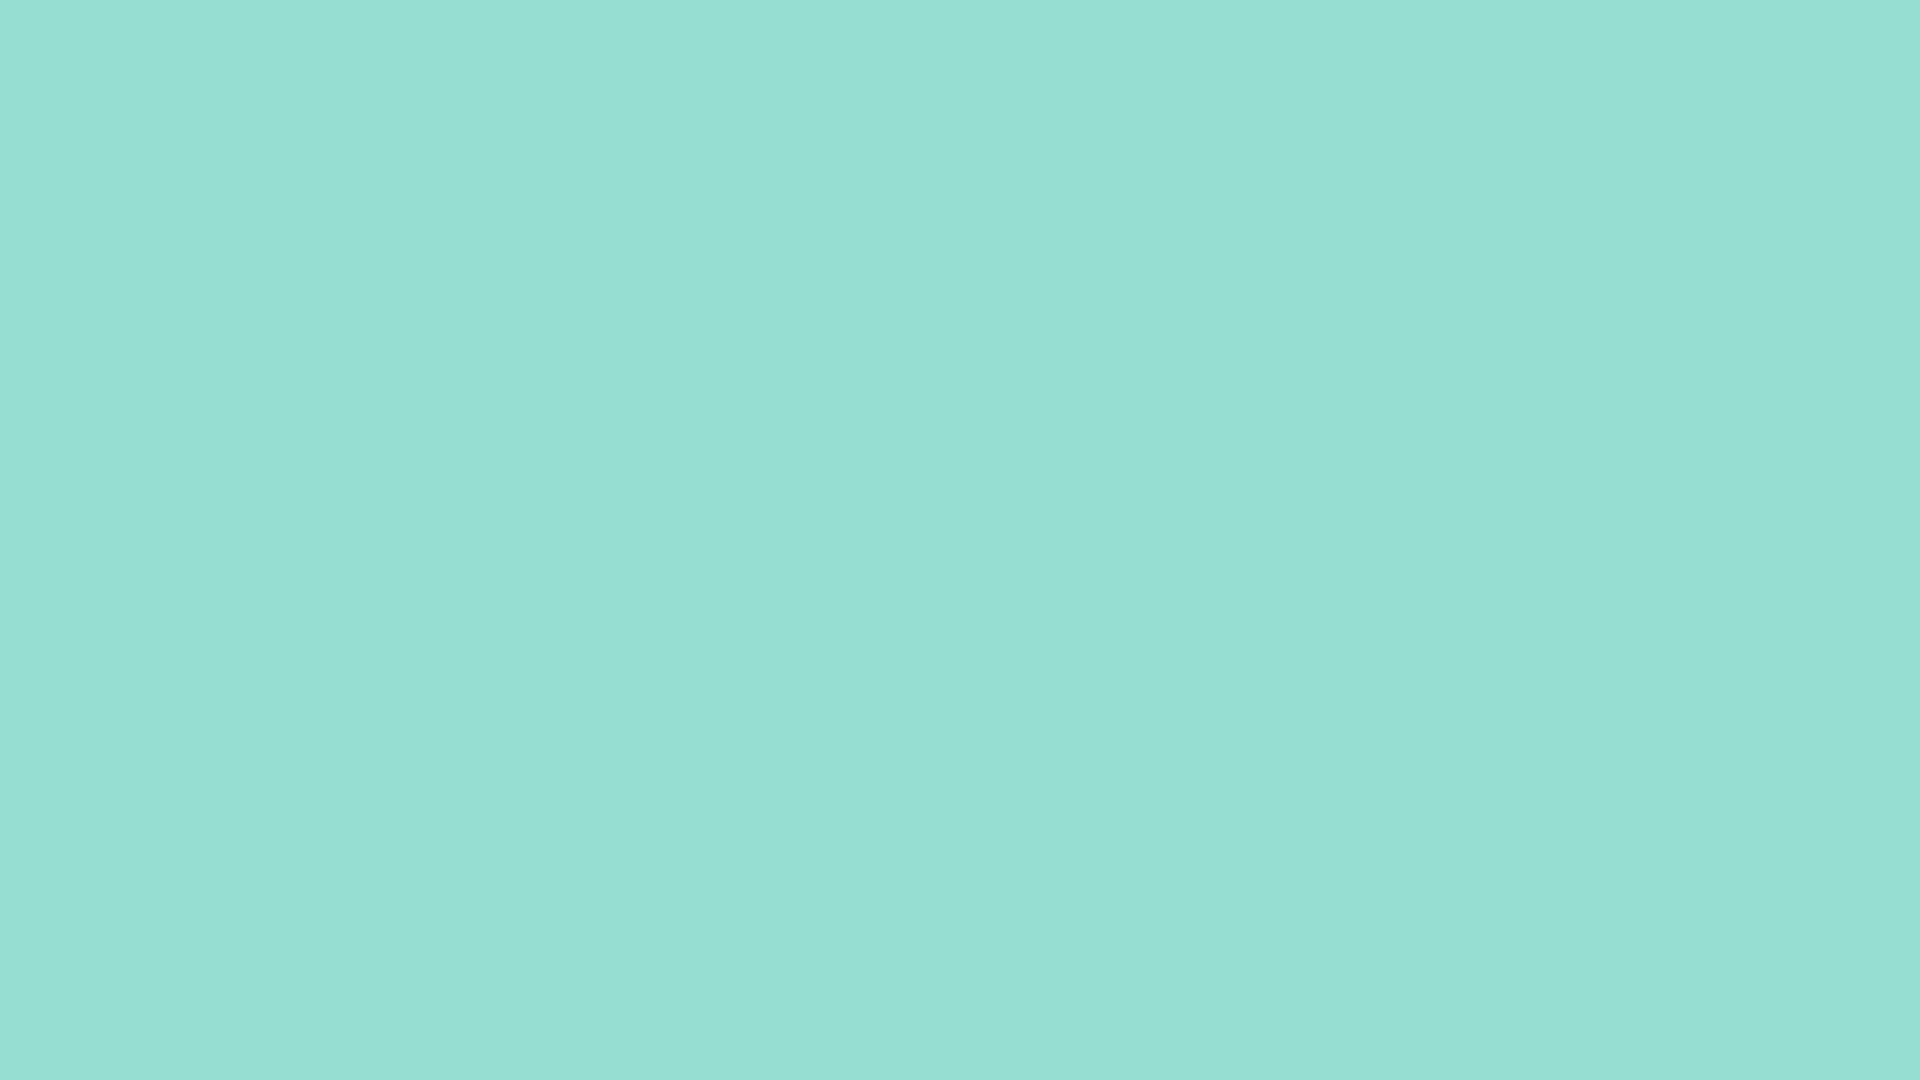 1920x1080 Pale Robin Egg Blue Solid Color Background